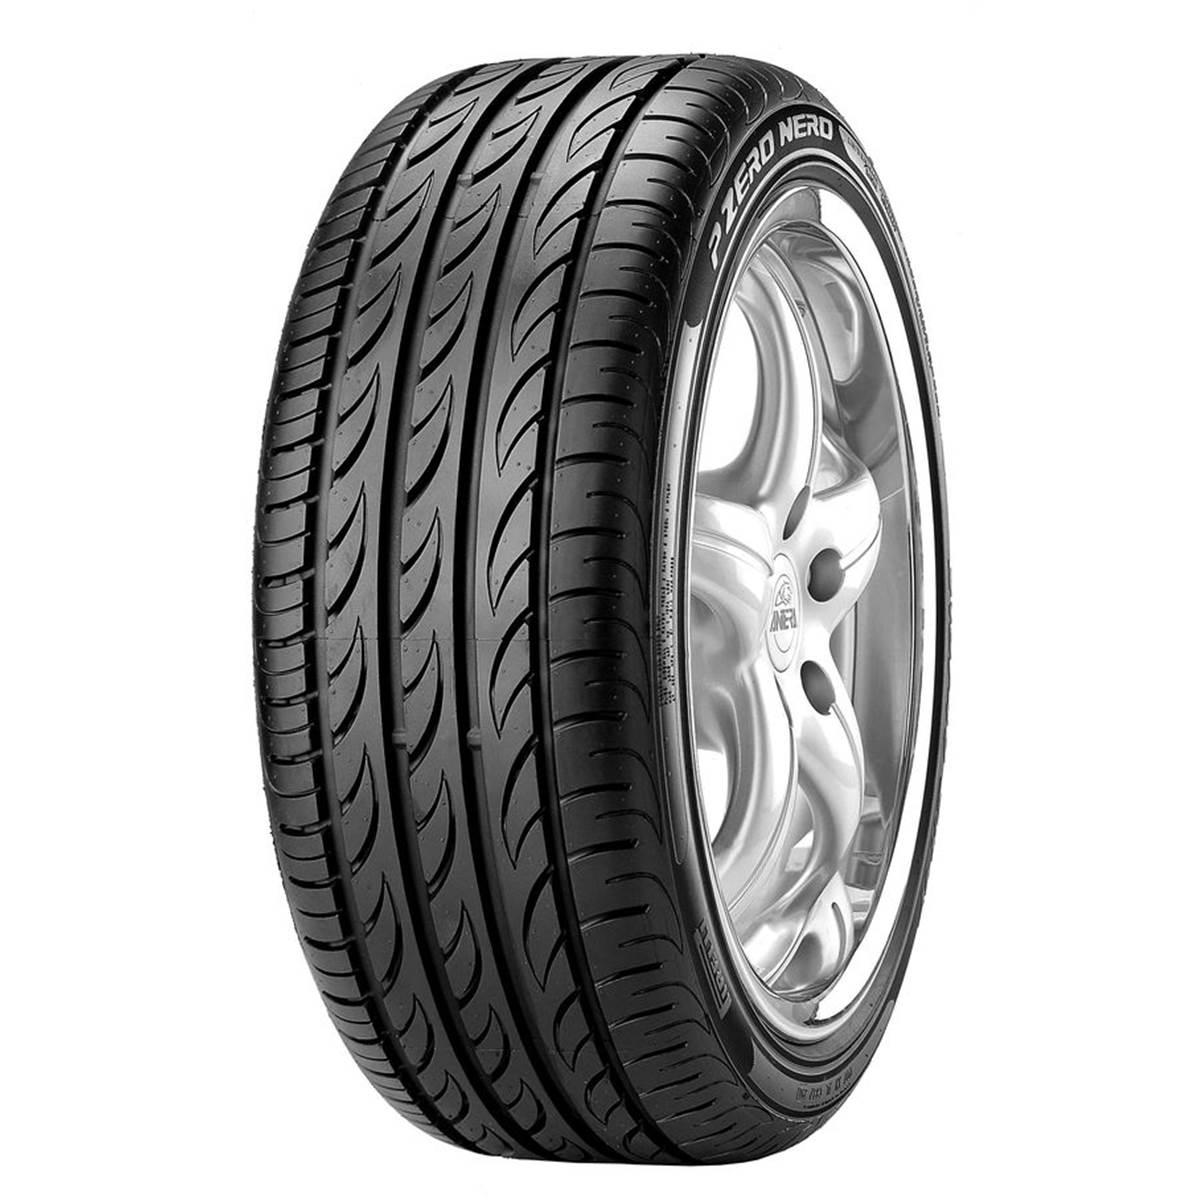 Pneu Pirelli 215/45R17 91Y Pzero Nero XL